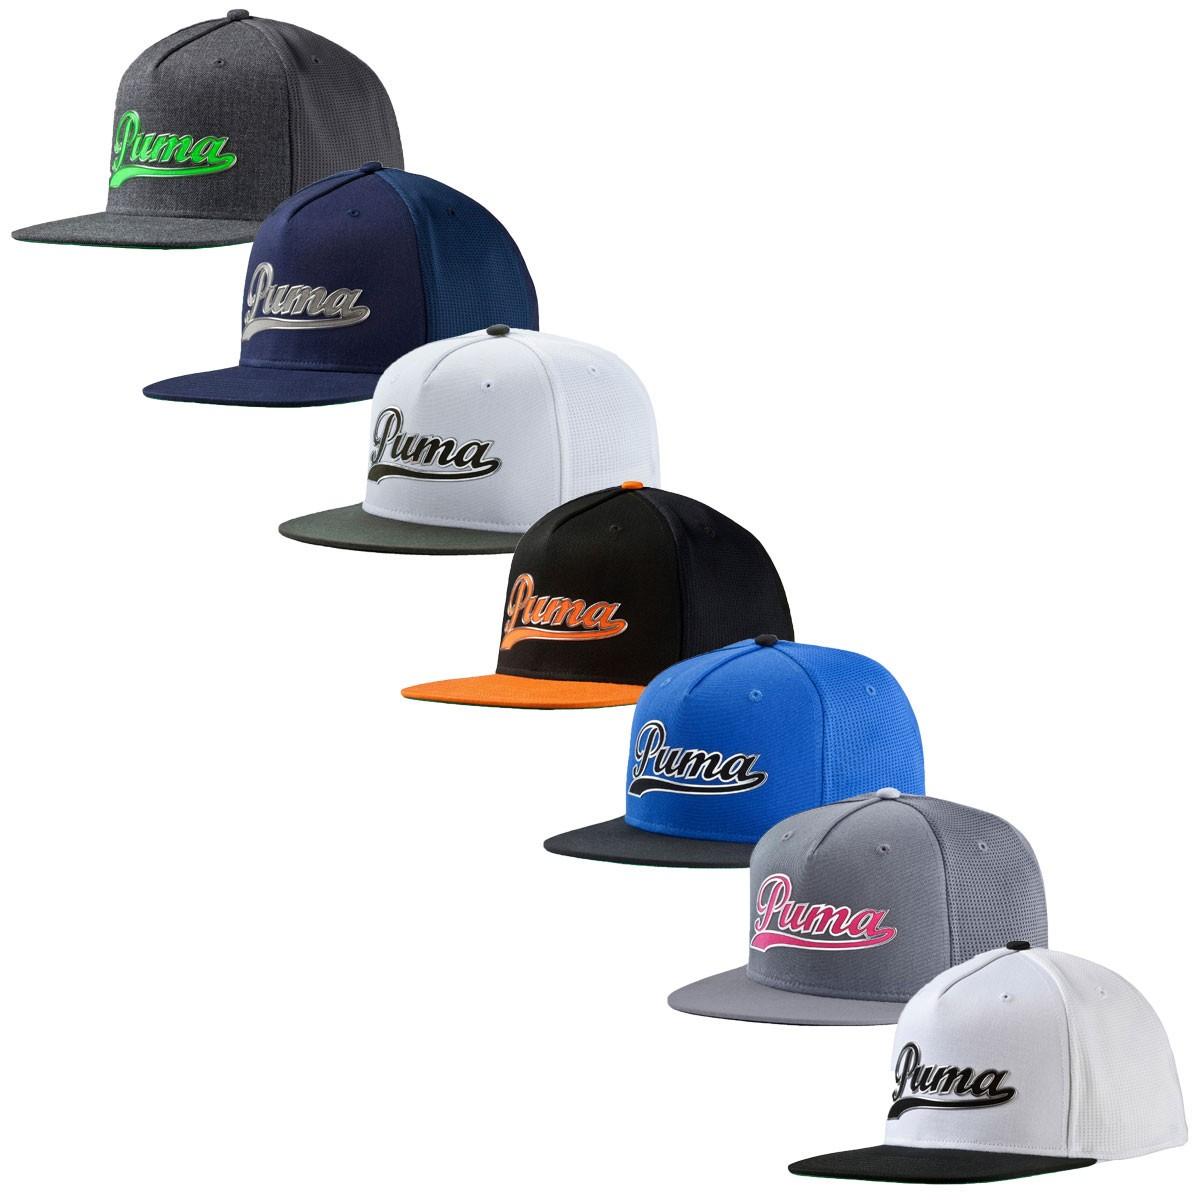 4b7de164b3b97 Puma Golf Mens Script Snapback Cap - Headwear - Clothing - Men